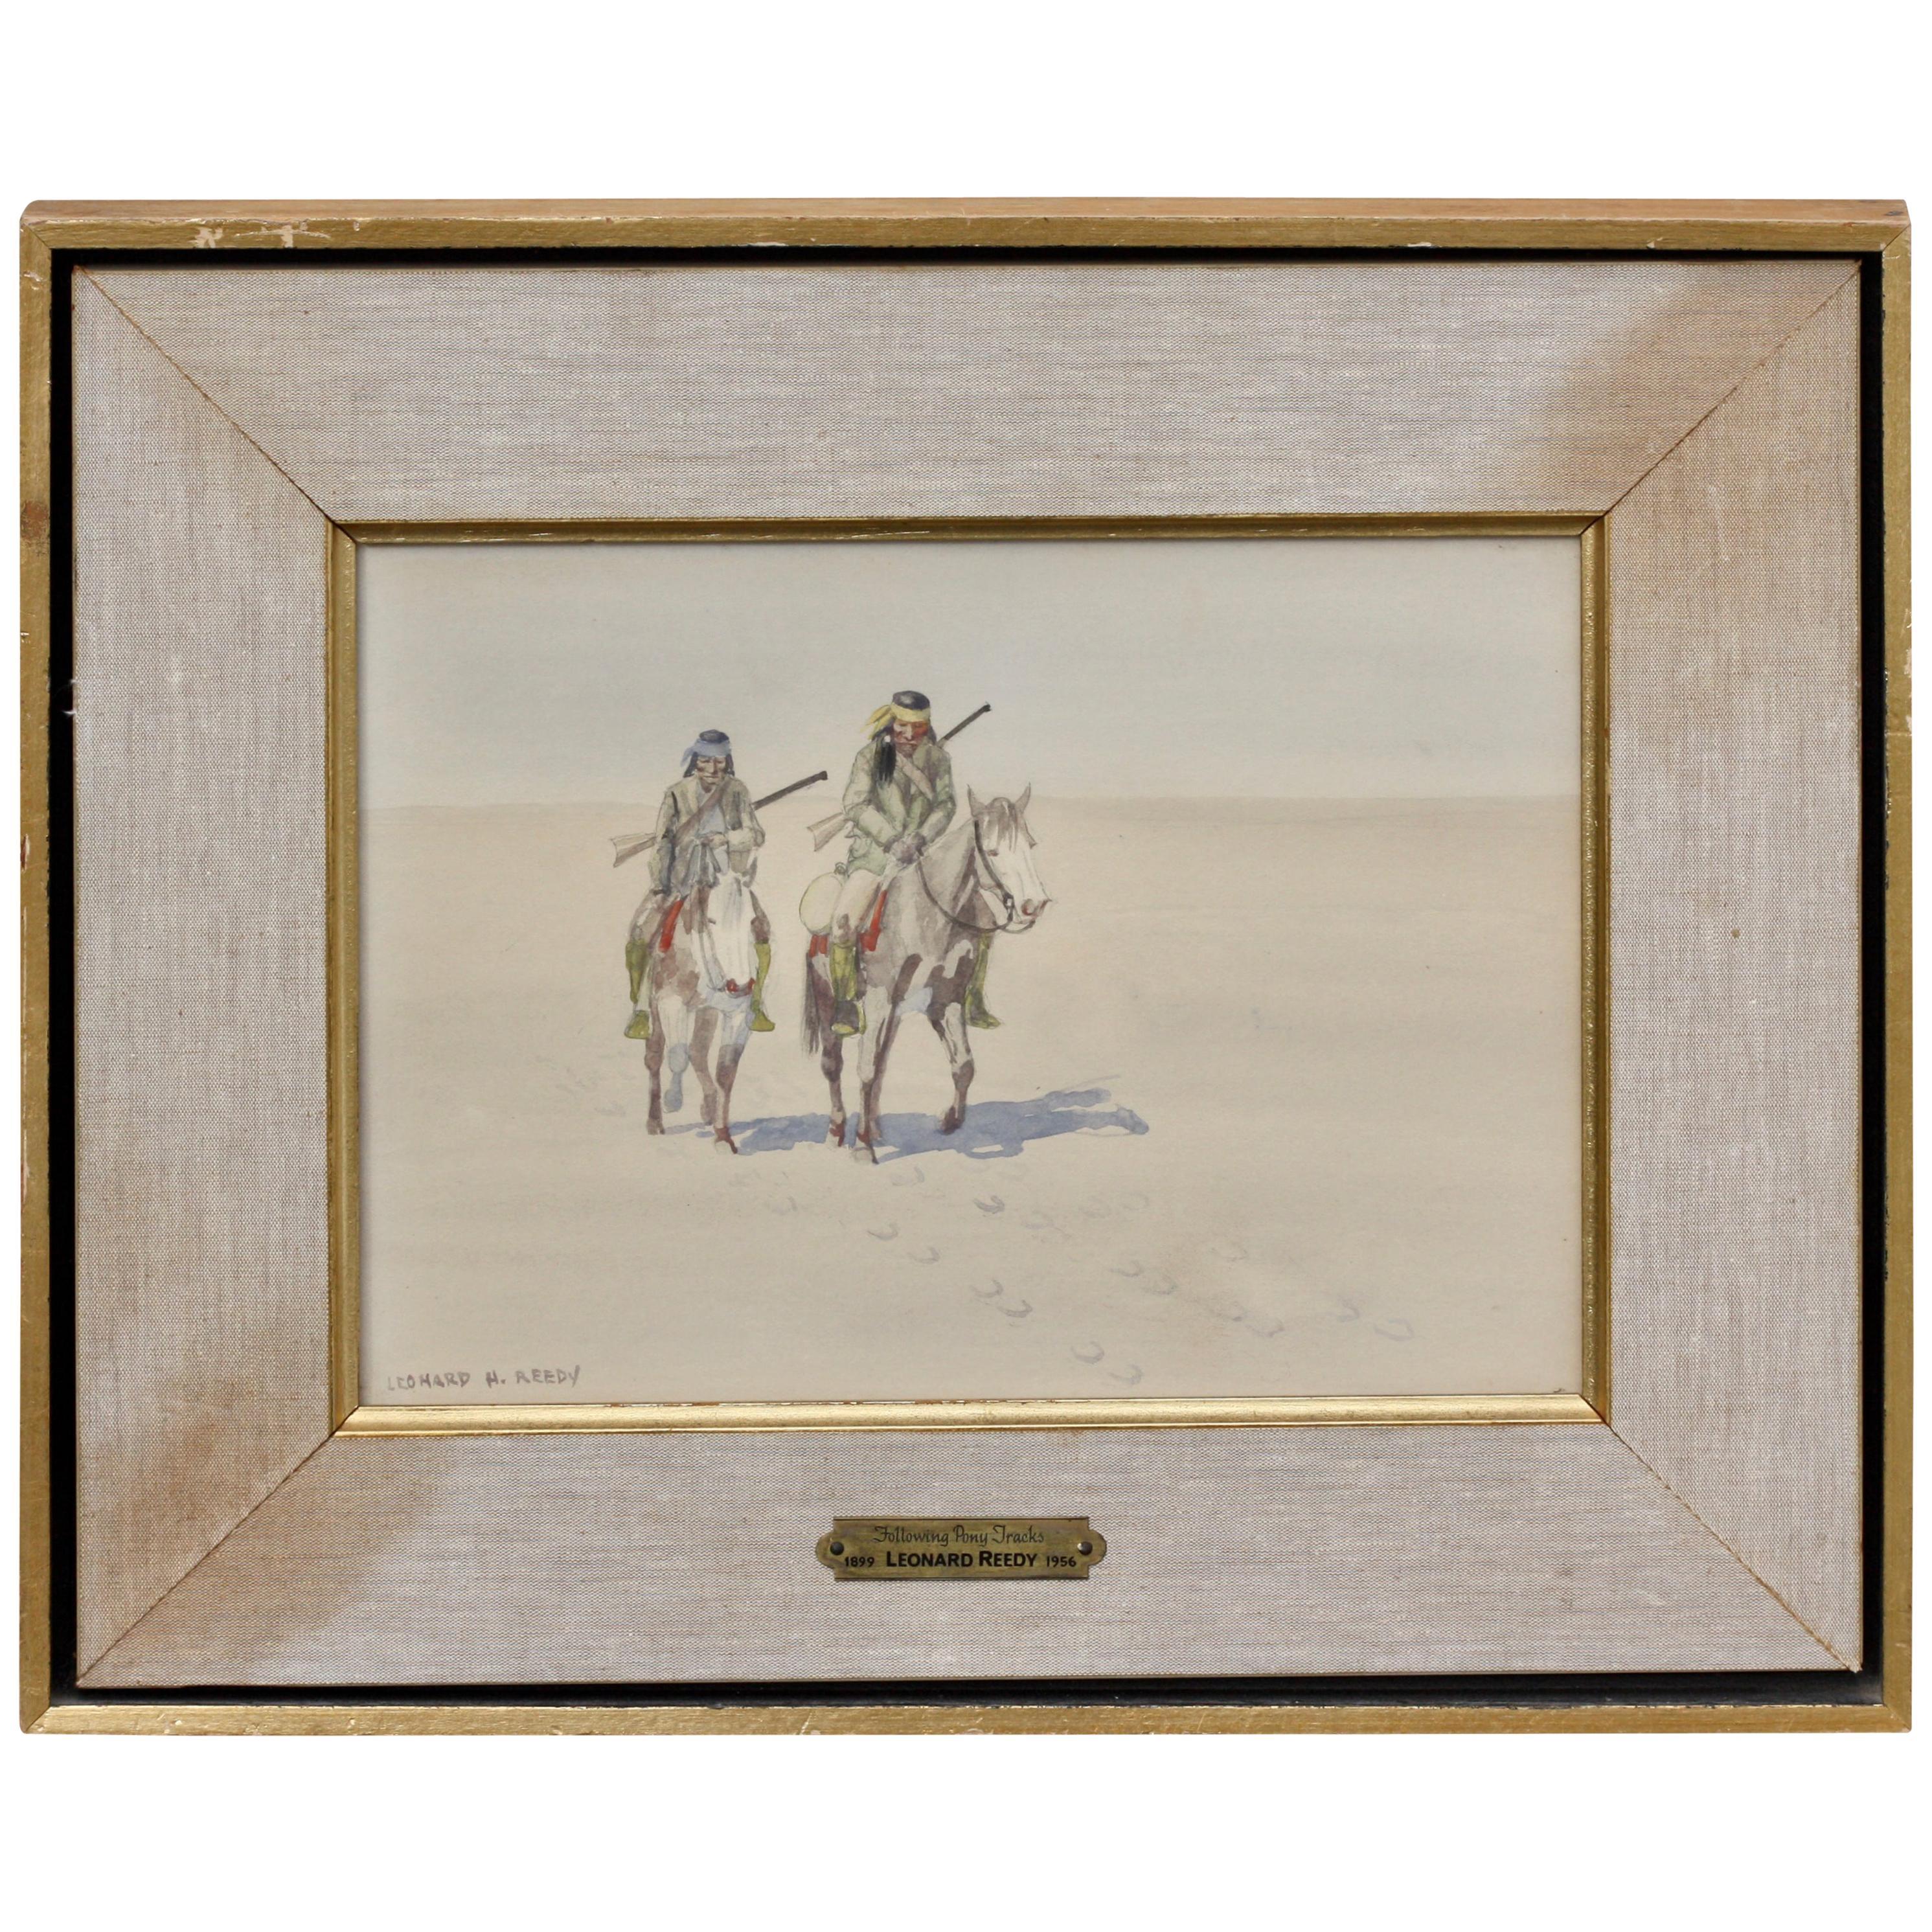 Leonard Howard Reedy Following Pony Tracks Drawing-Watercolor